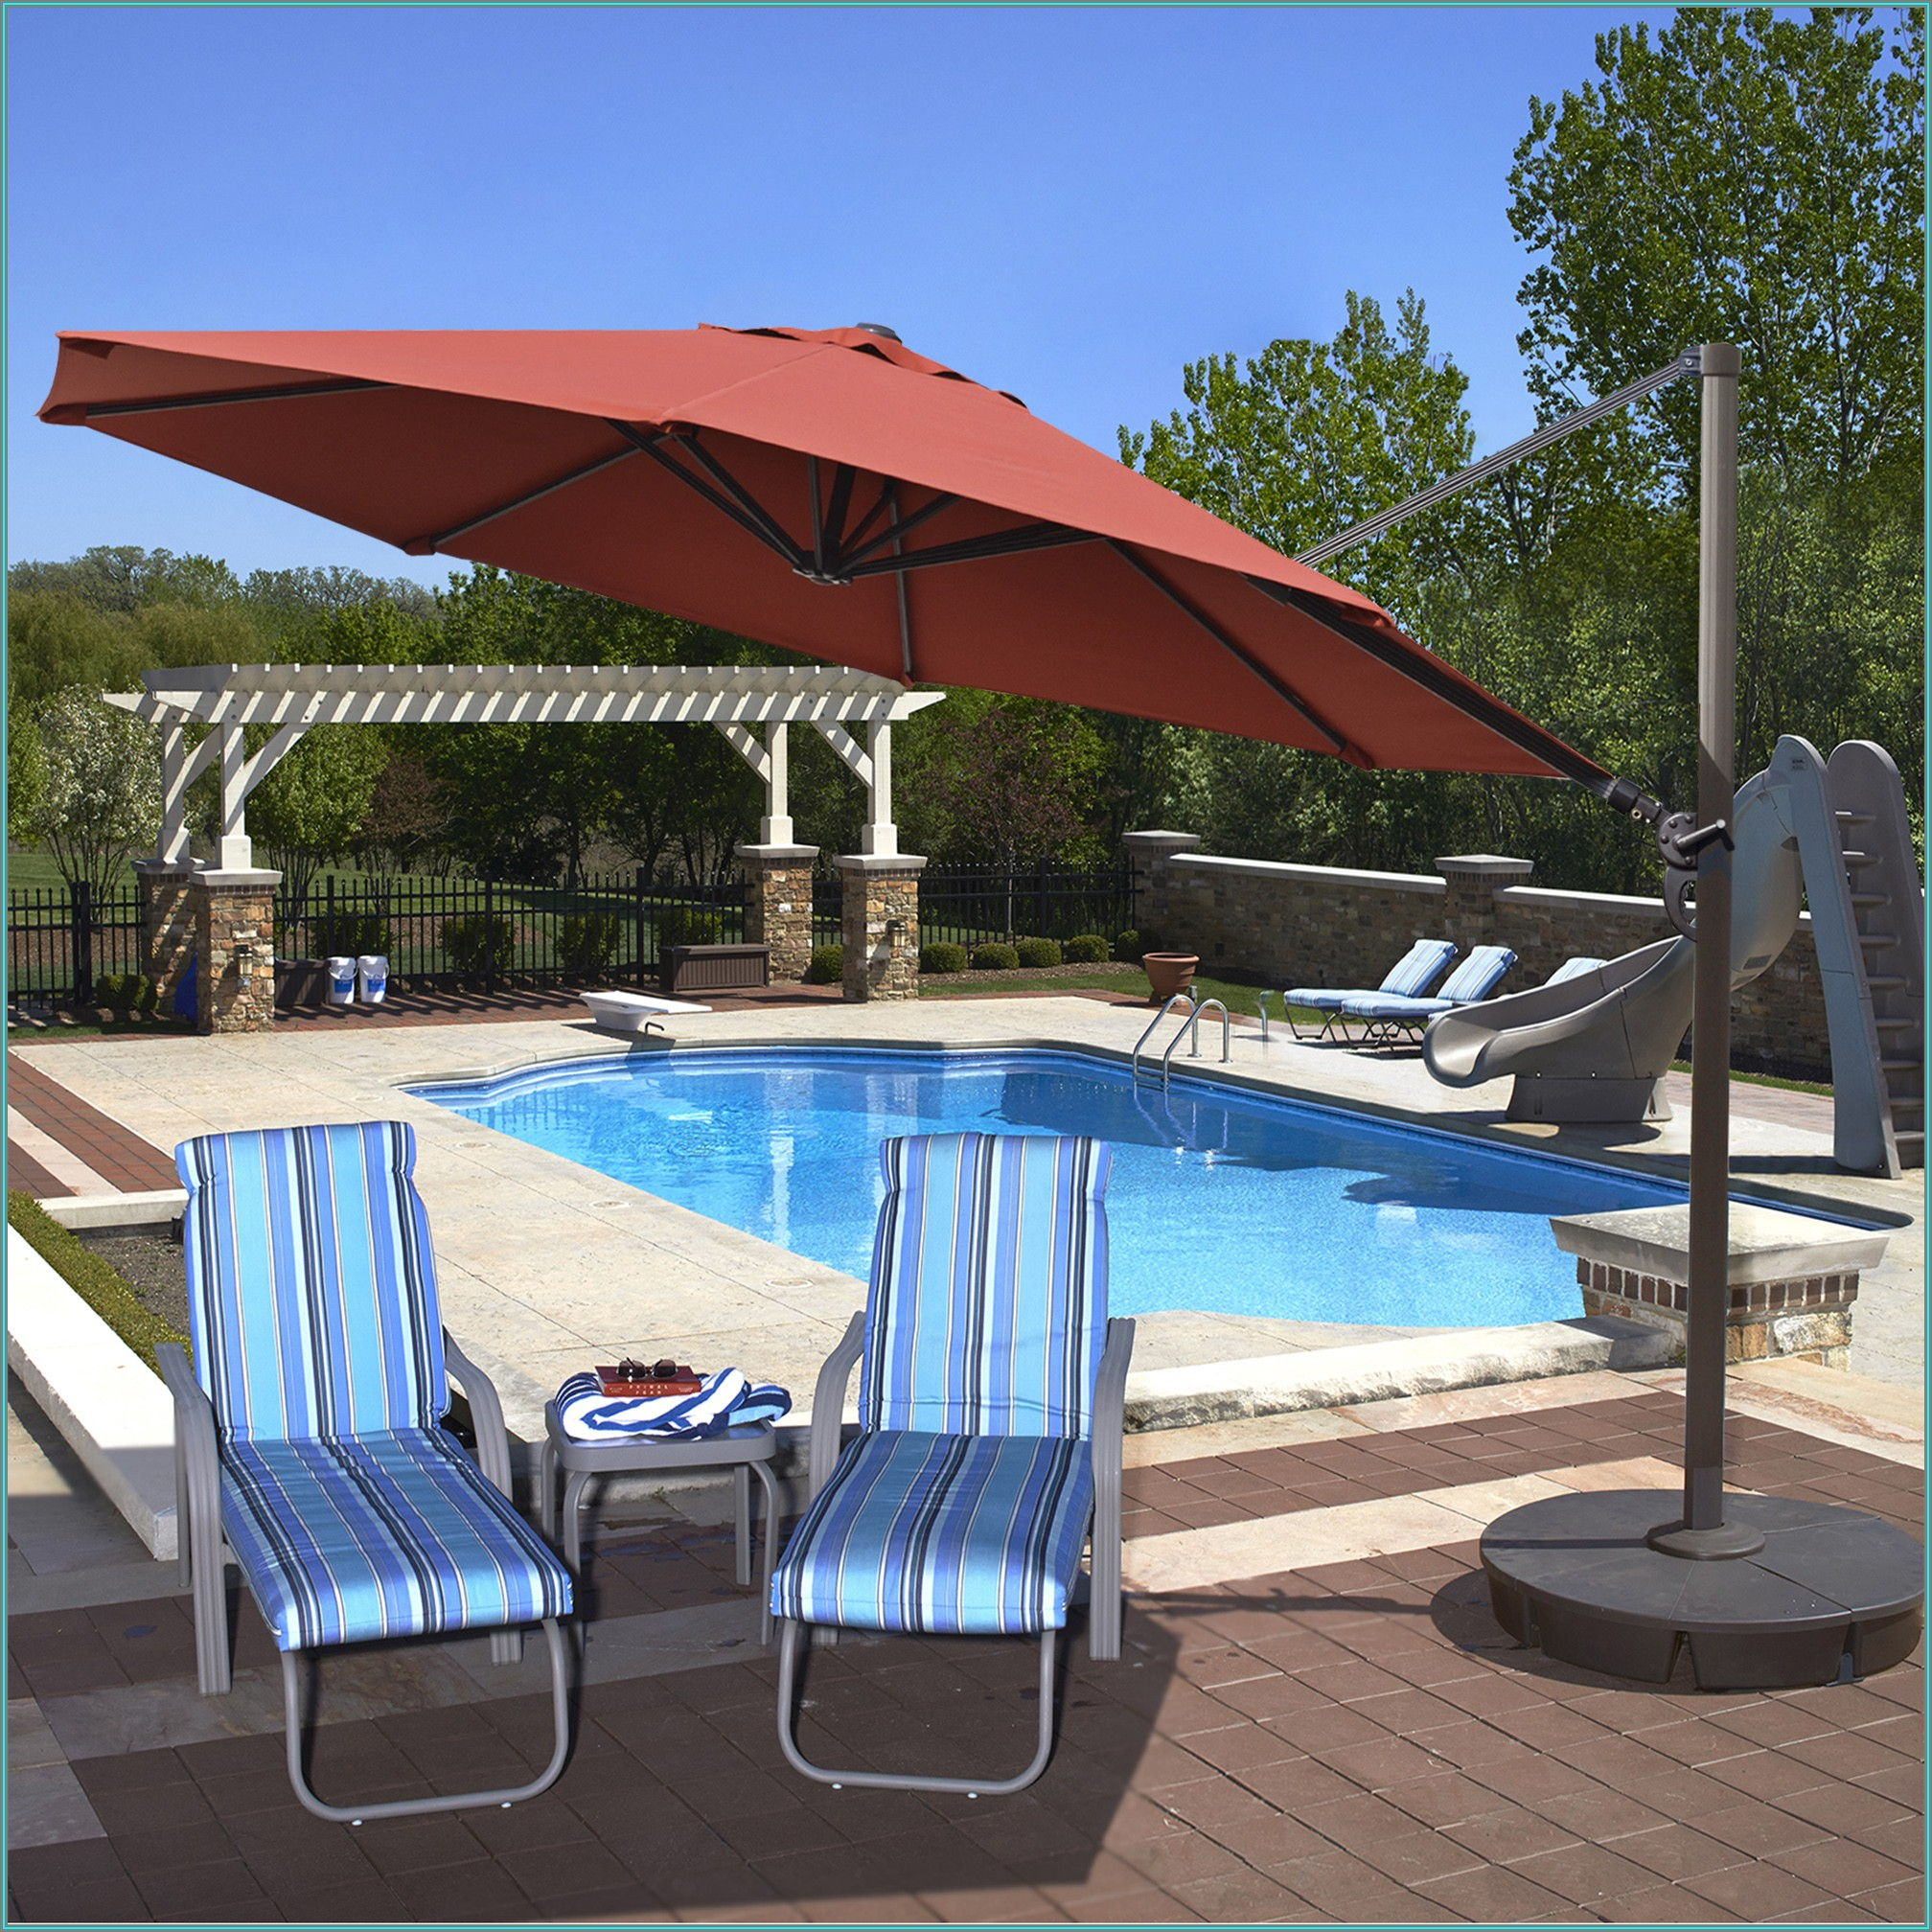 13 Cantilever Patio Umbrella